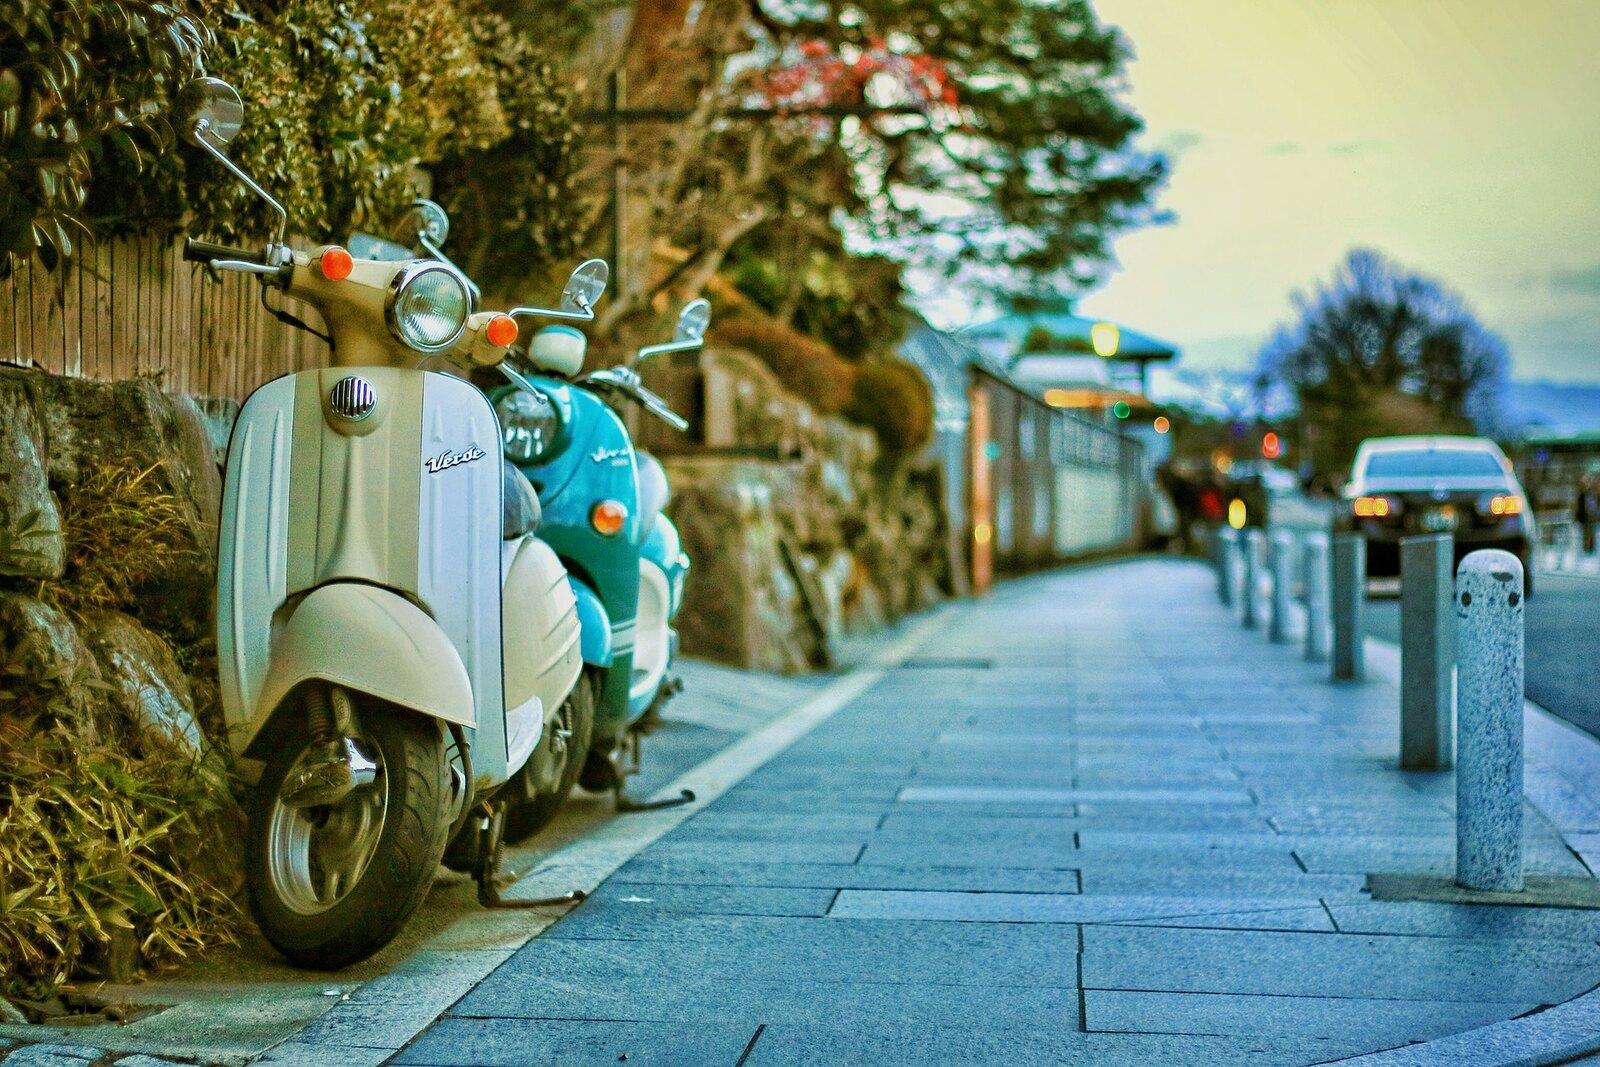 eric-dearbeck-sidewalk-scooter-13